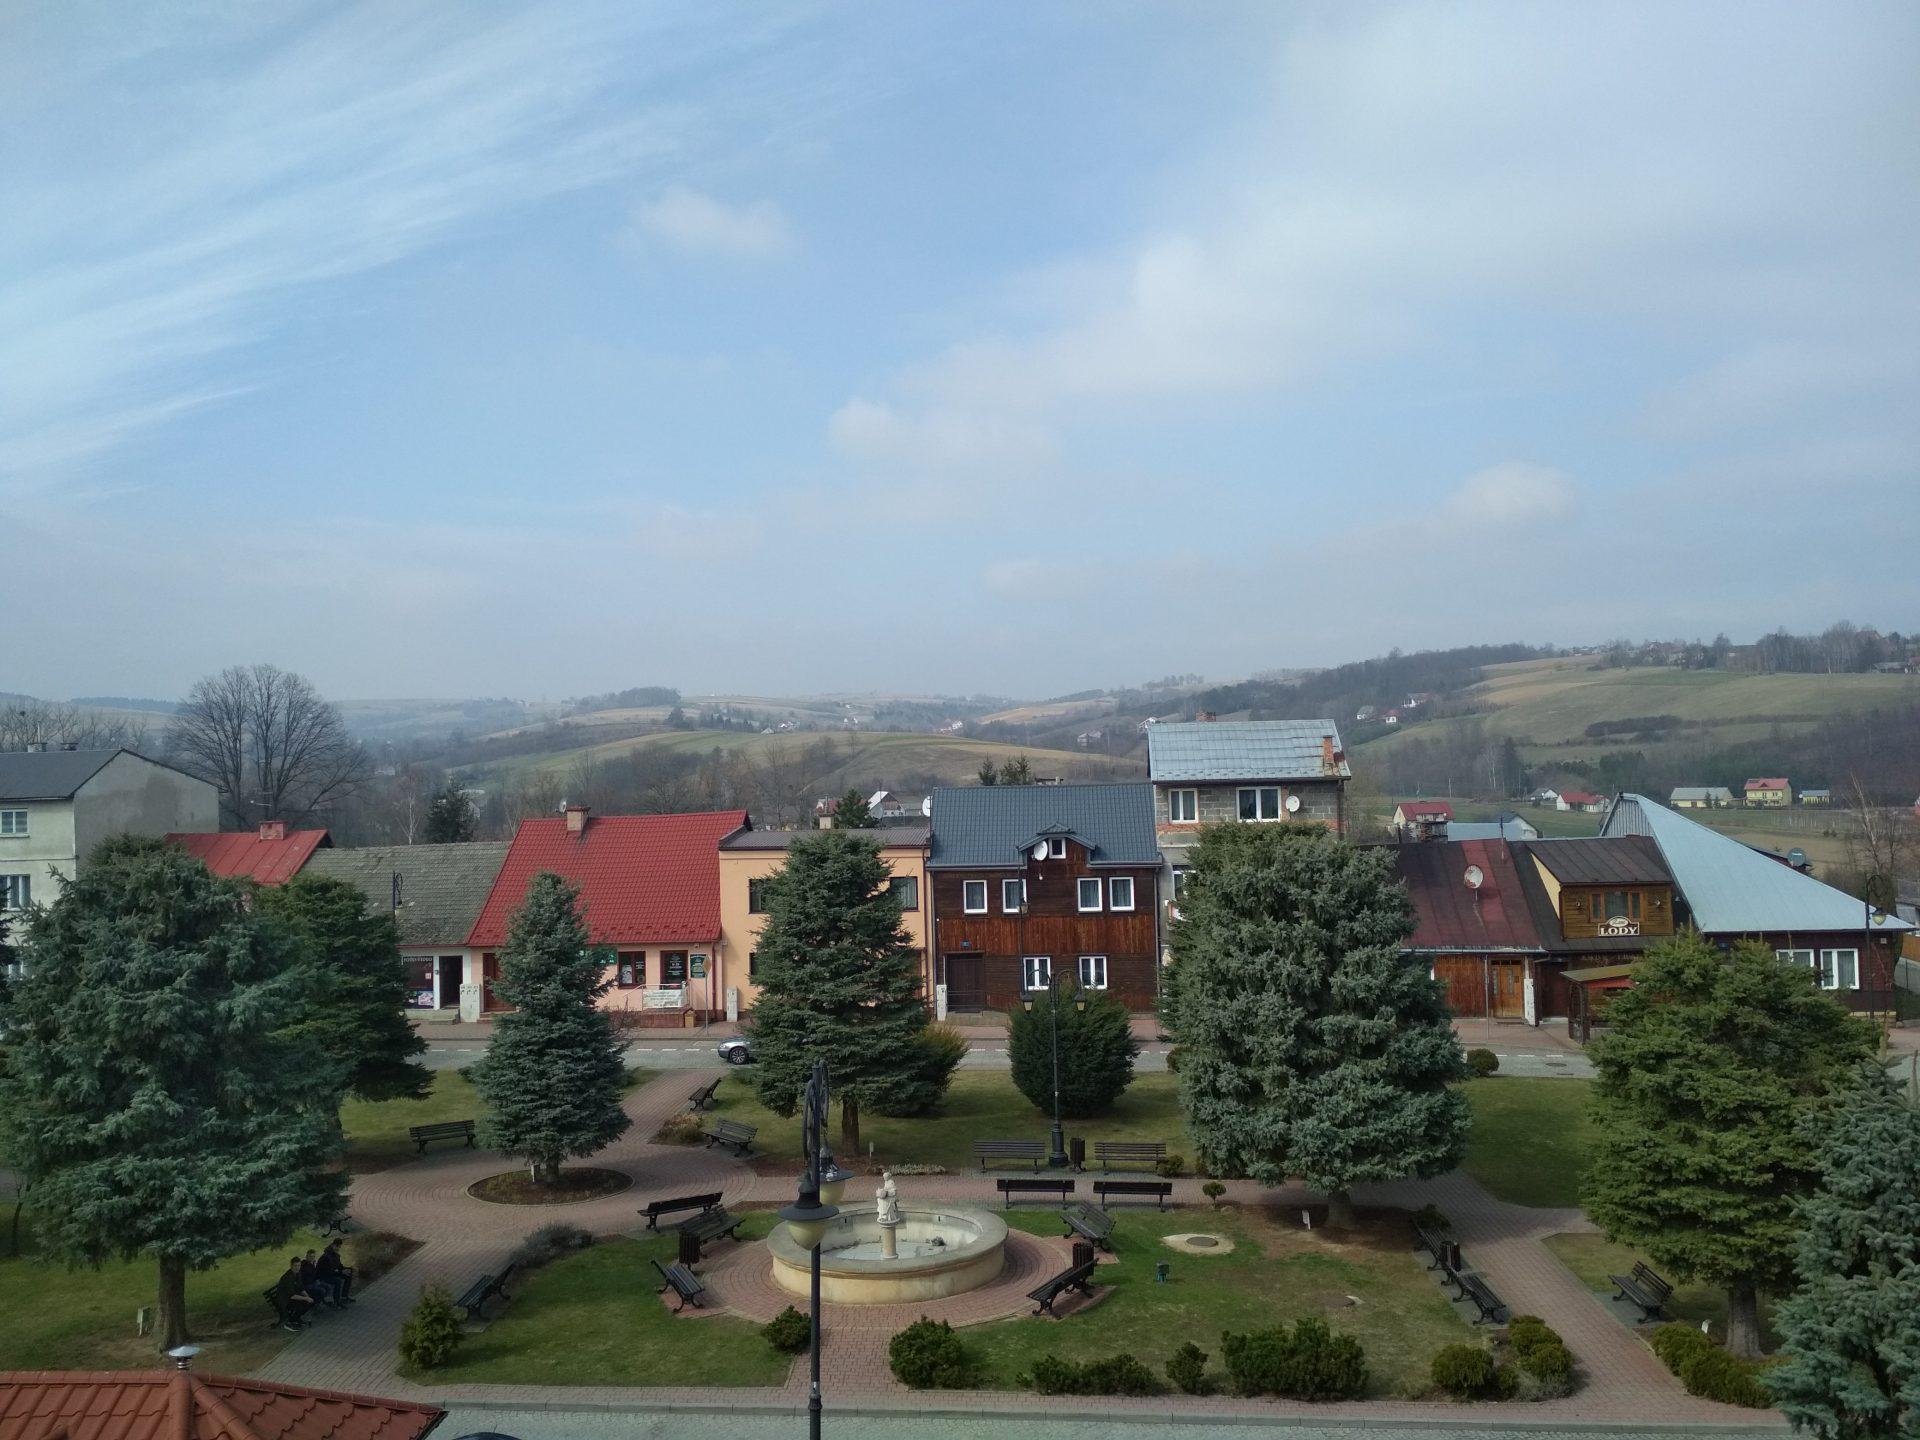 Belz, Bobowa, Leżajsk: Official Memory about the Jewish Past